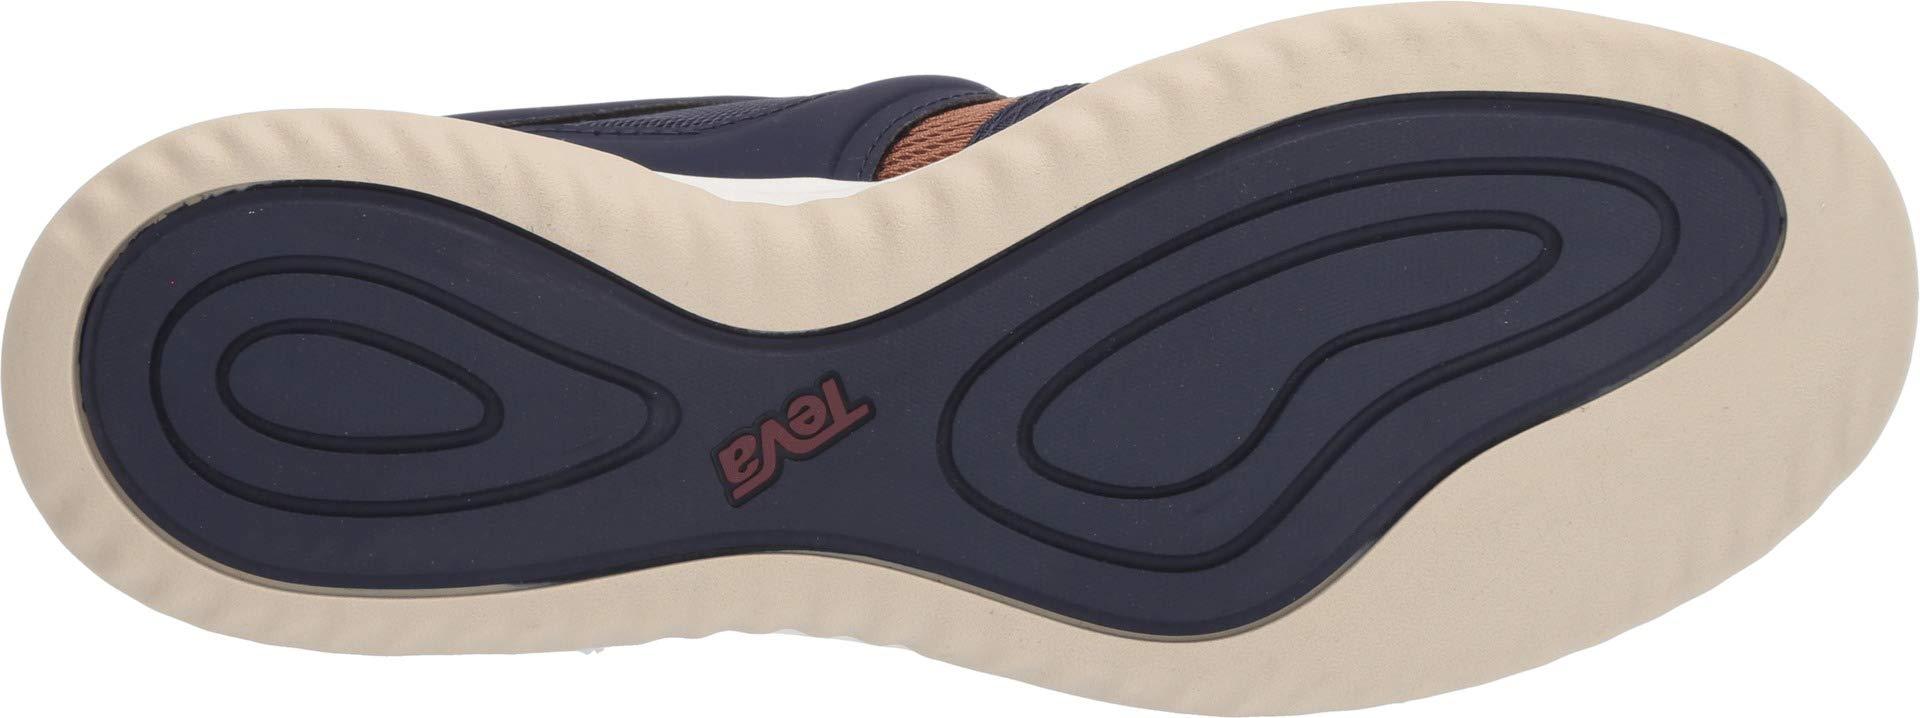 Teva Mens Terra-Float Churn Sneaker, Pecan, Size 12 by Teva